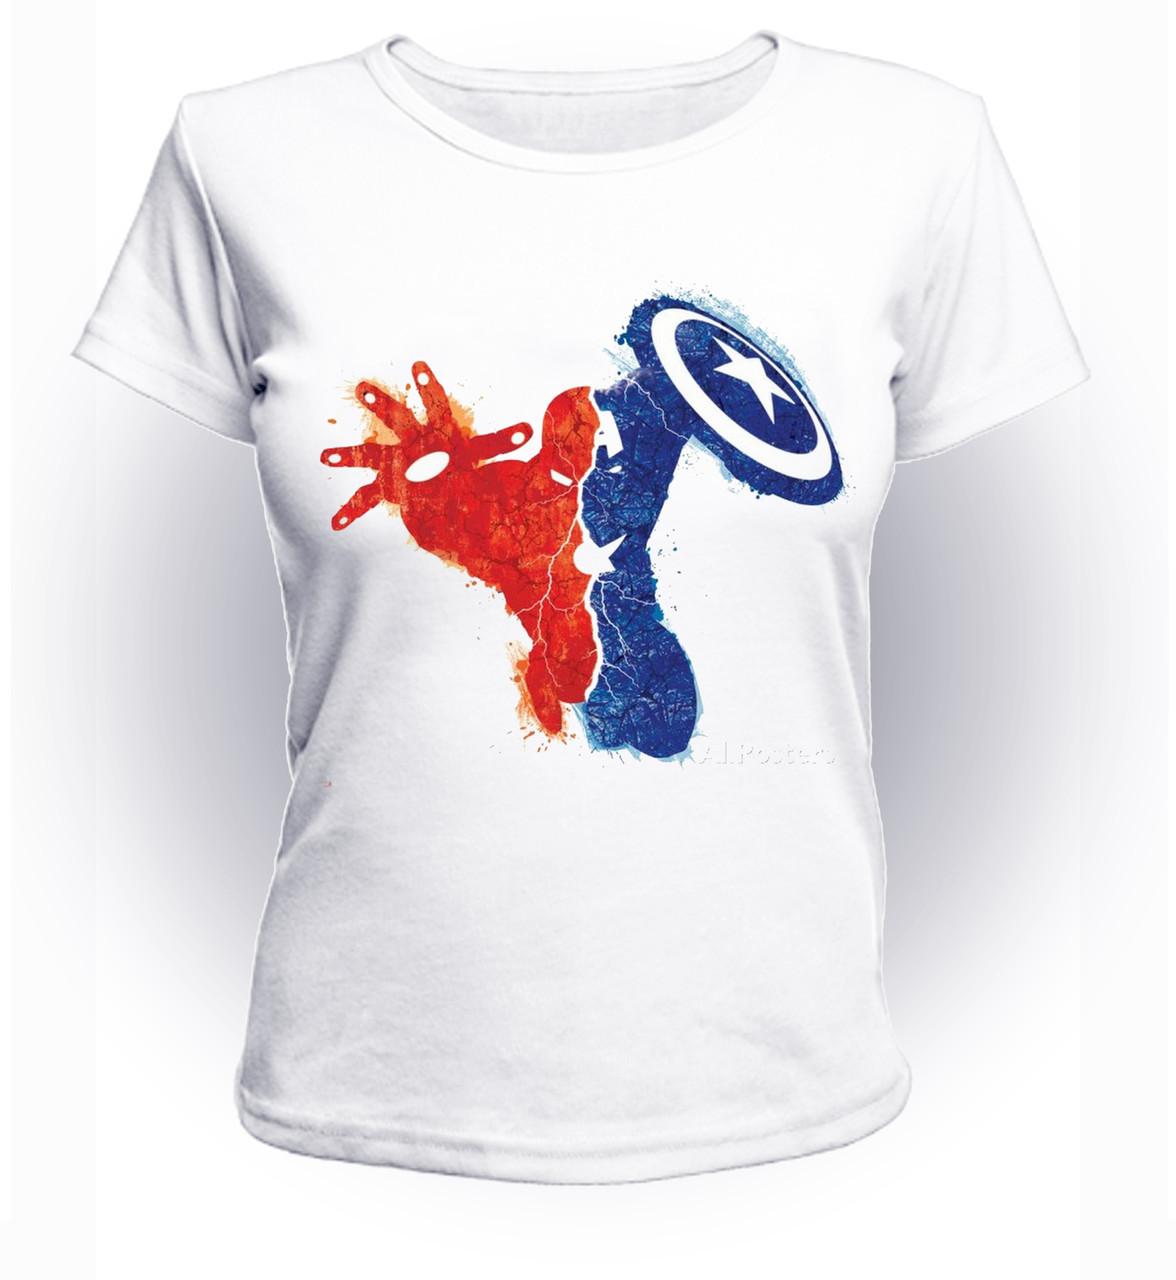 Футболка женская GeekLand Железный Человек Iron Man Раскол art IM.01.060